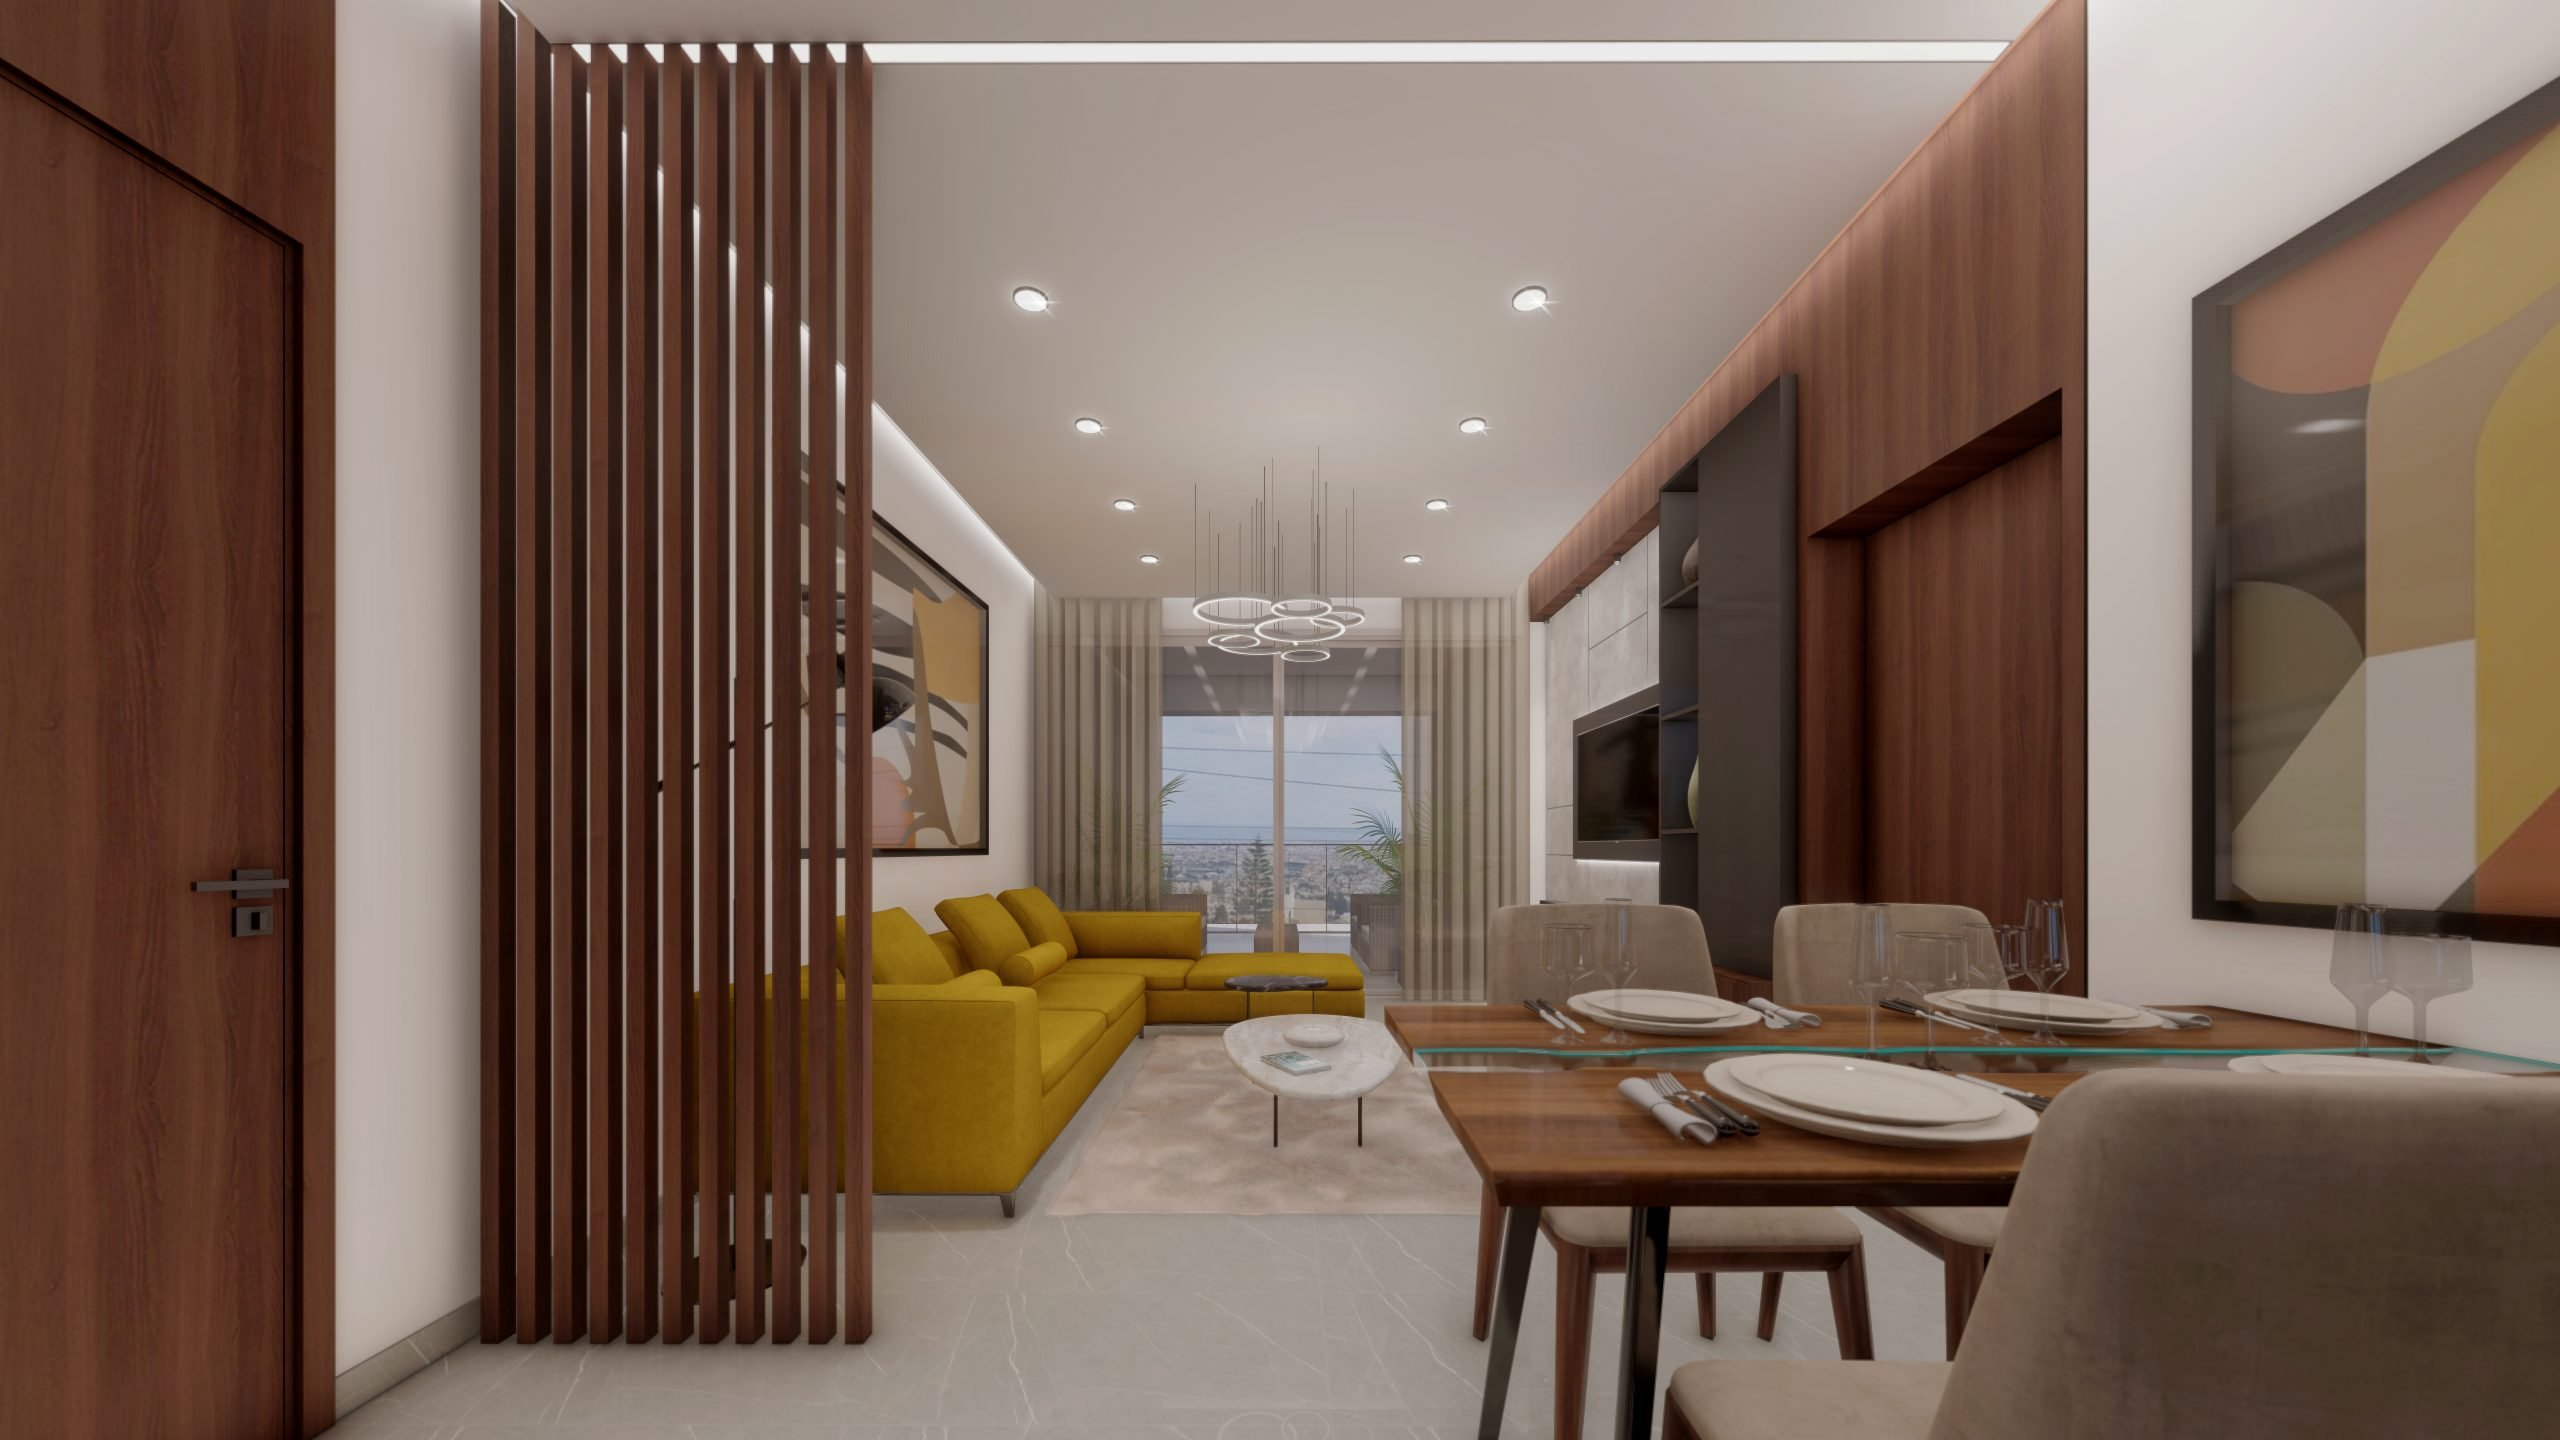 Living Room & Kitchen_1- Living room & Kitchen